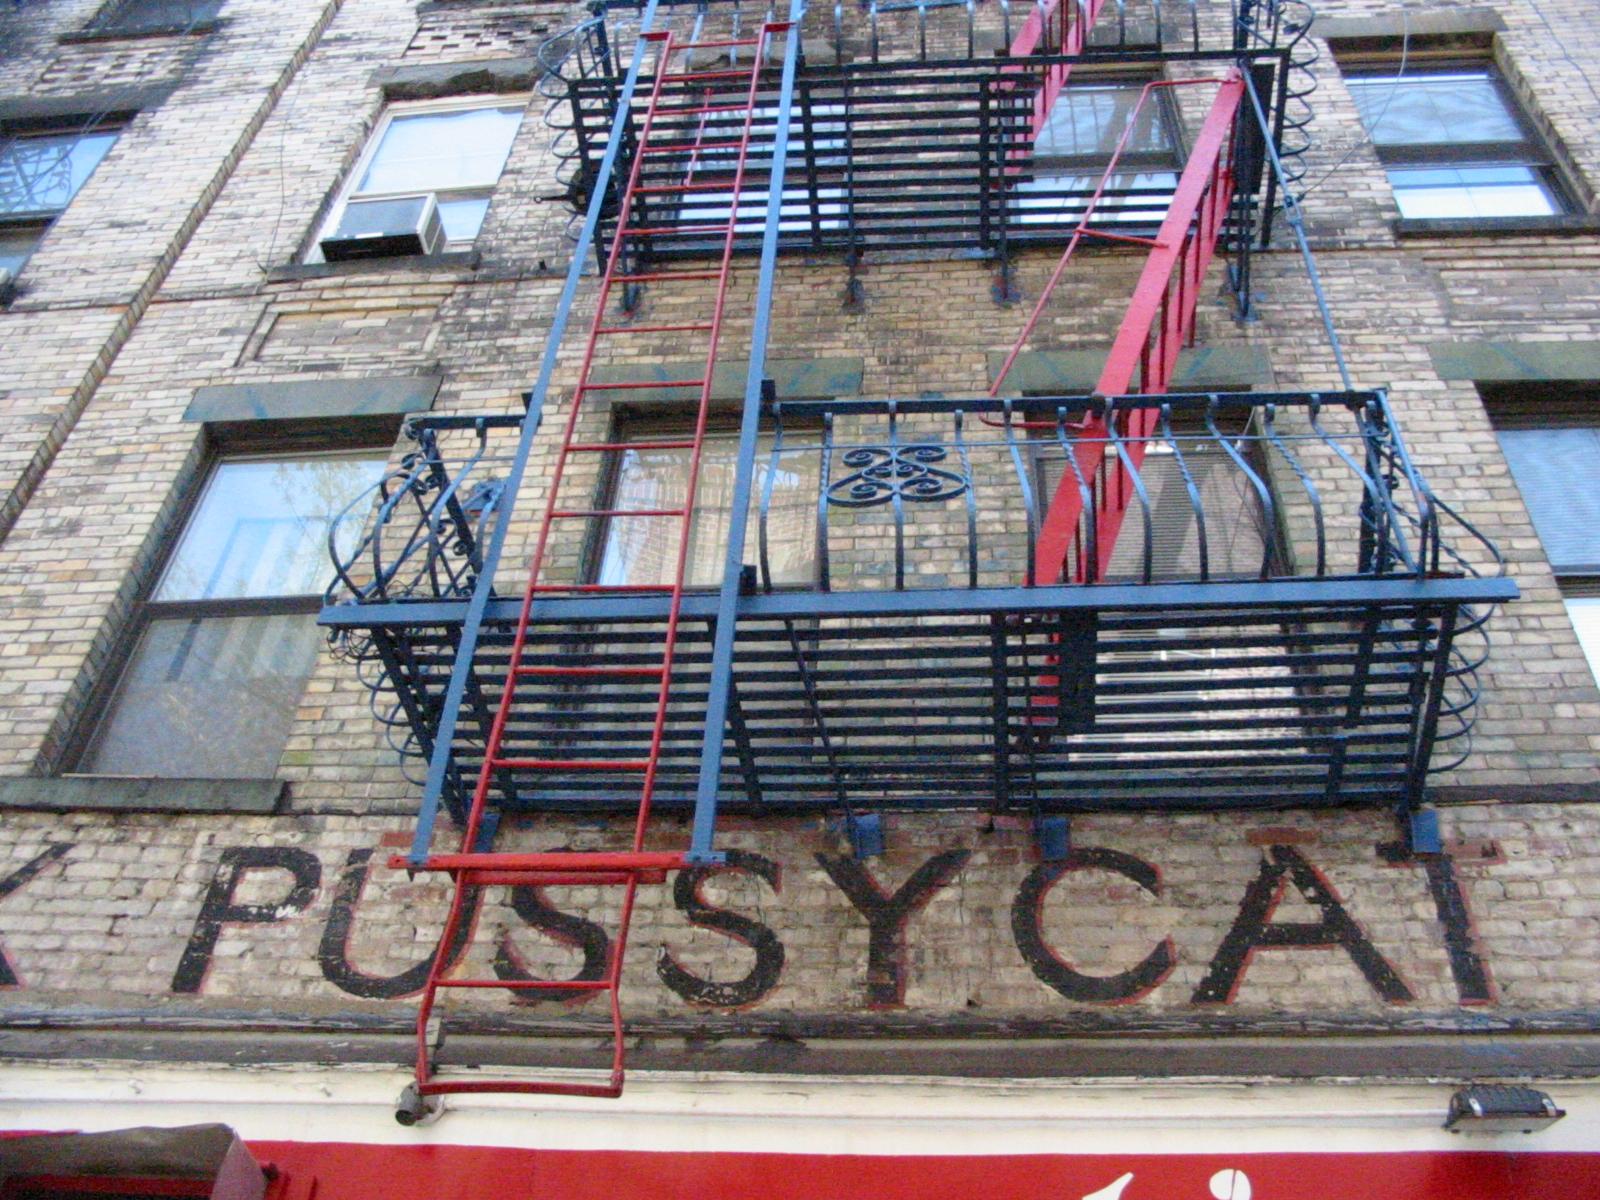 The Fat Black Pussycat | W 3rd St, New York, NY